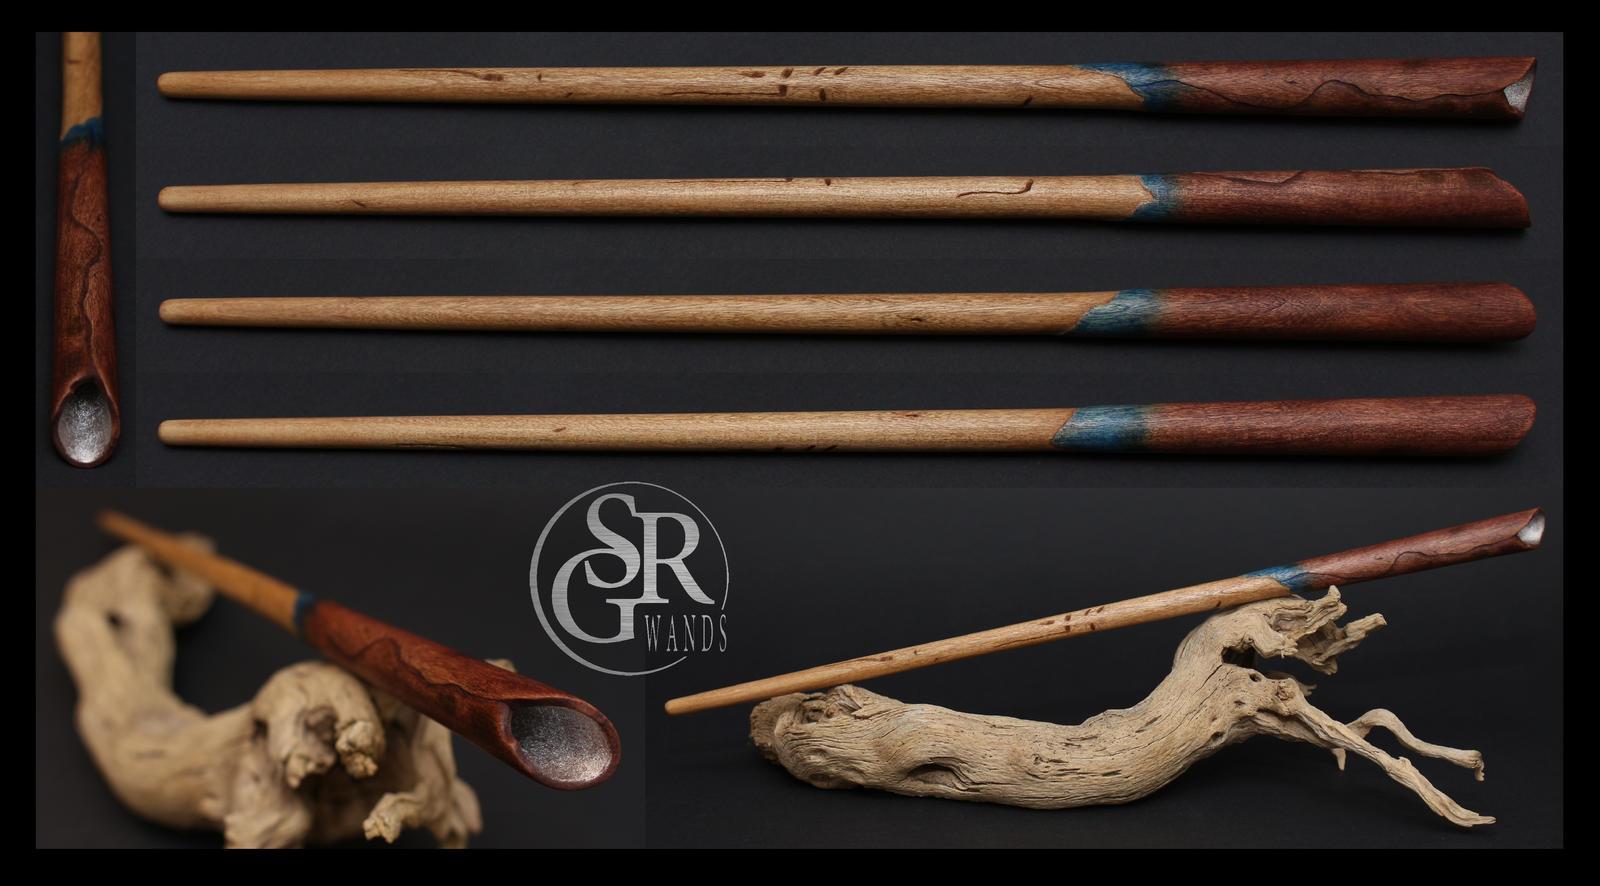 Newt scamander wand wood replica by srg wands on deviantart for Elder wand wood replica